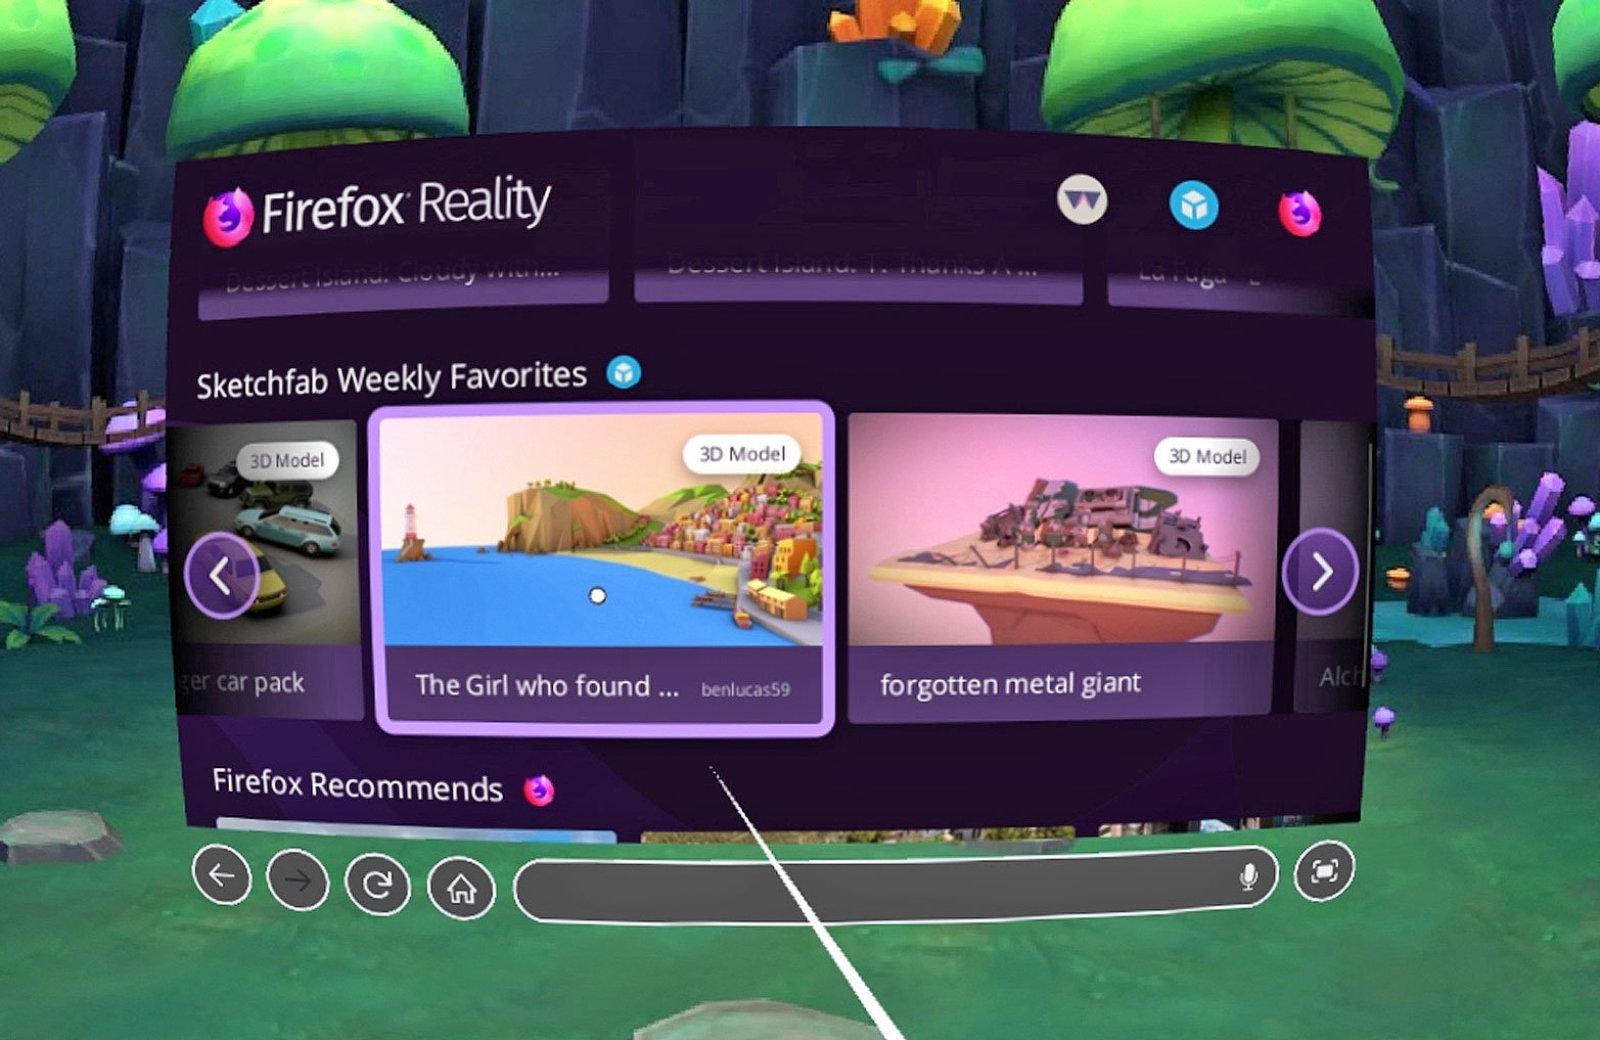 mozilla firefox reality